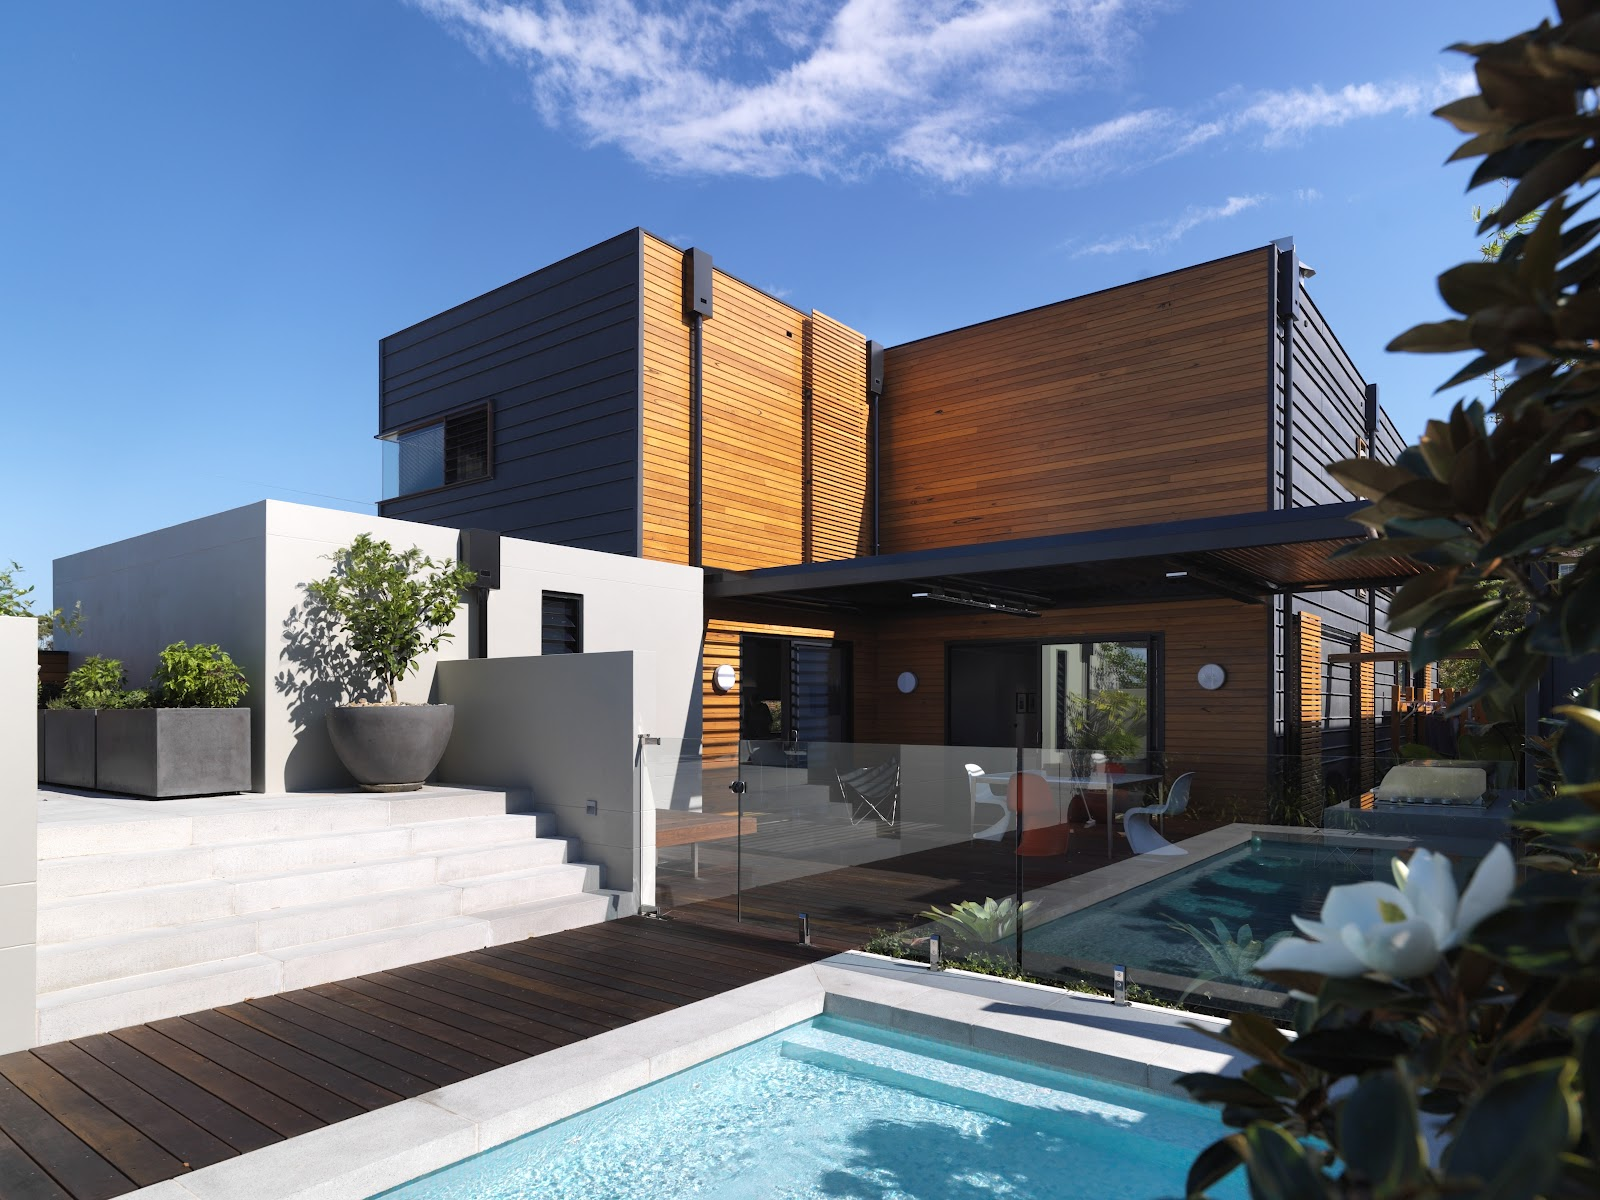 Prefab Homes And Modular Homes In Australia Prefab Homes